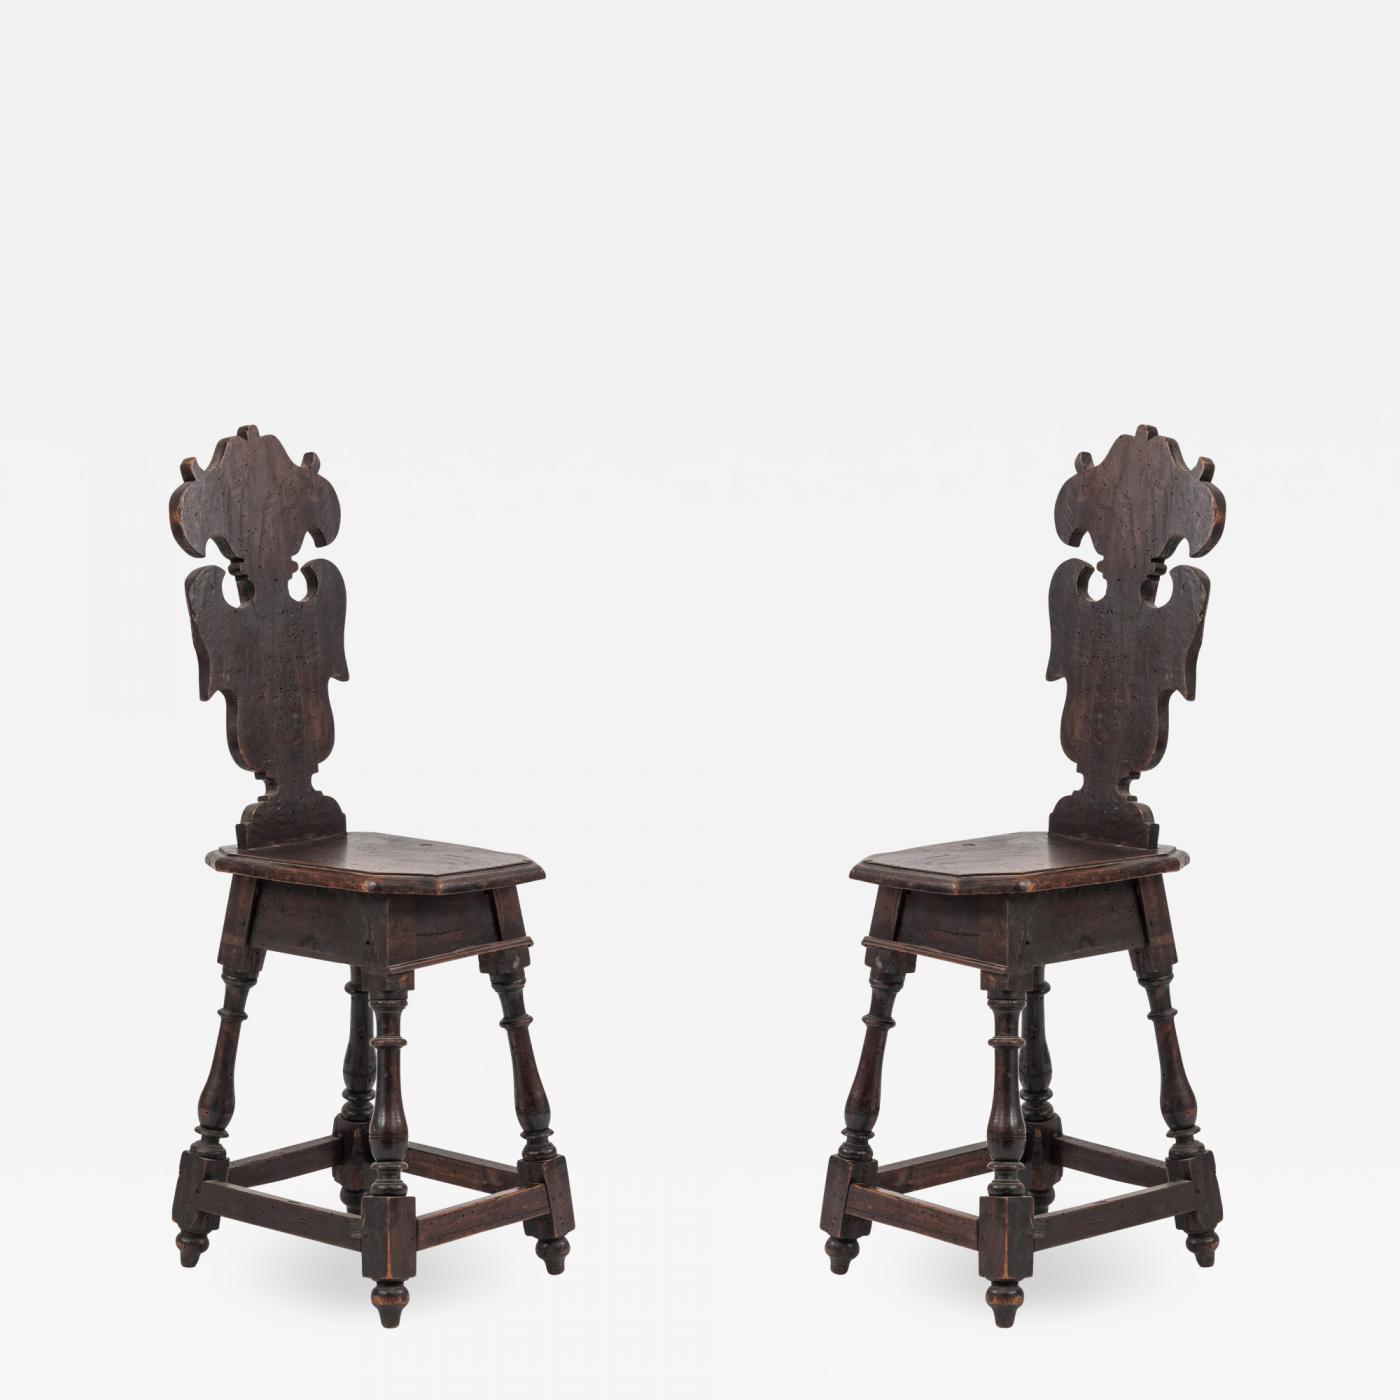 Sgabelli American Style.Pair Of Italian Renaissance Sgabelli Side Chairs